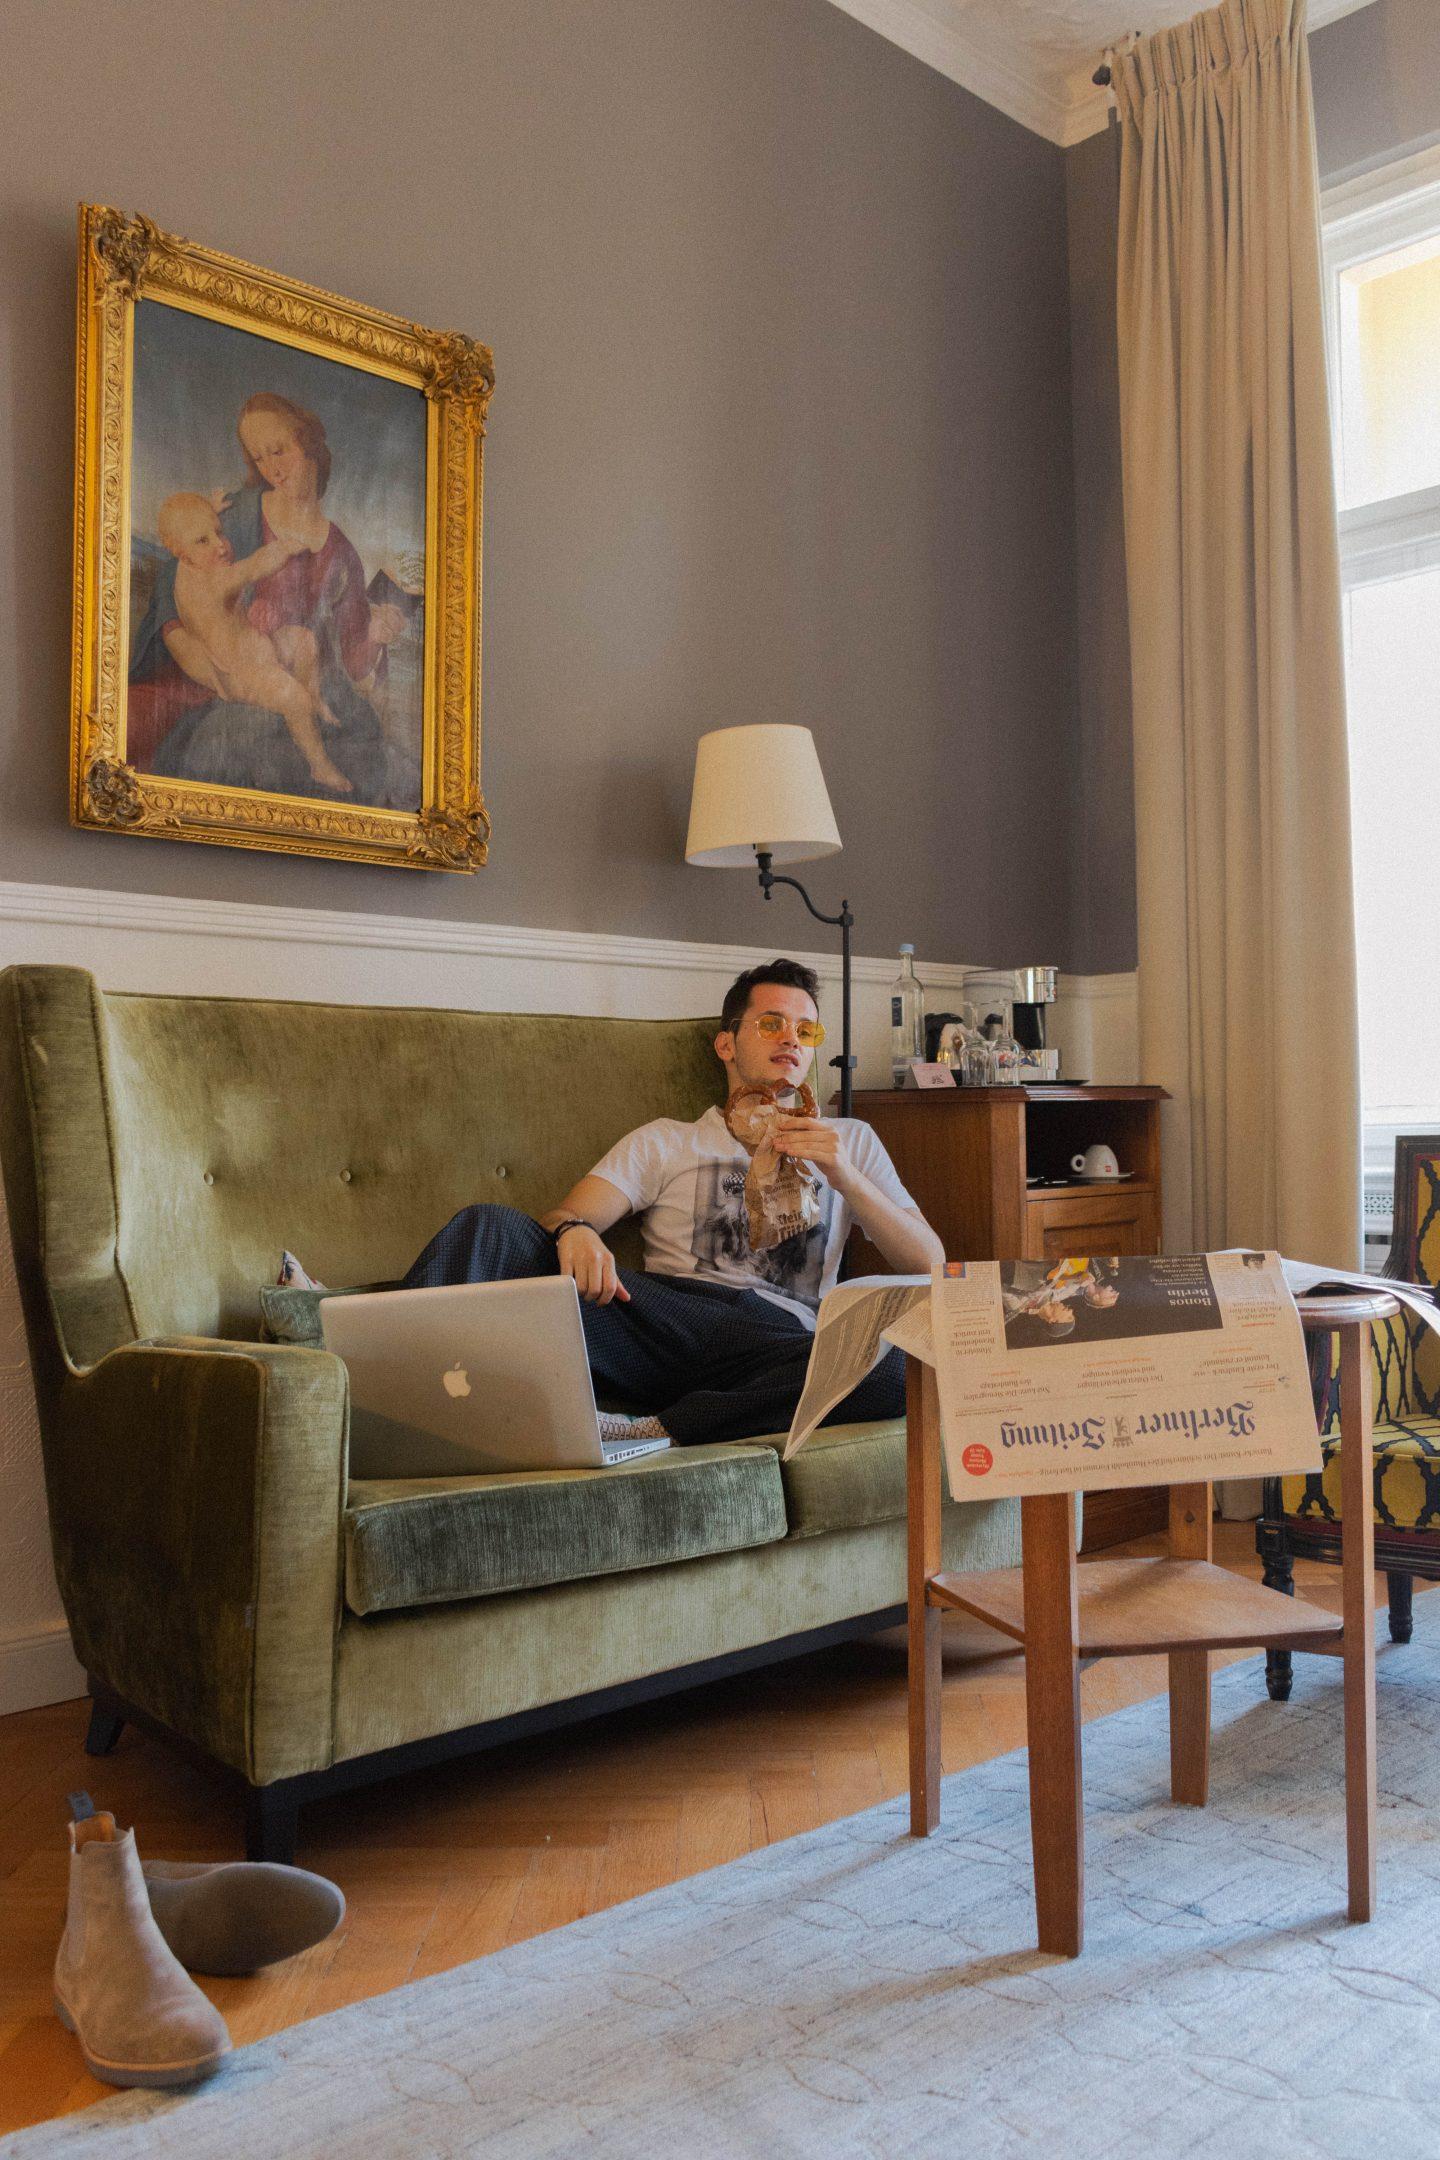 henri hotel berlin a retro boutique in kurf rstendamm elefv. Black Bedroom Furniture Sets. Home Design Ideas